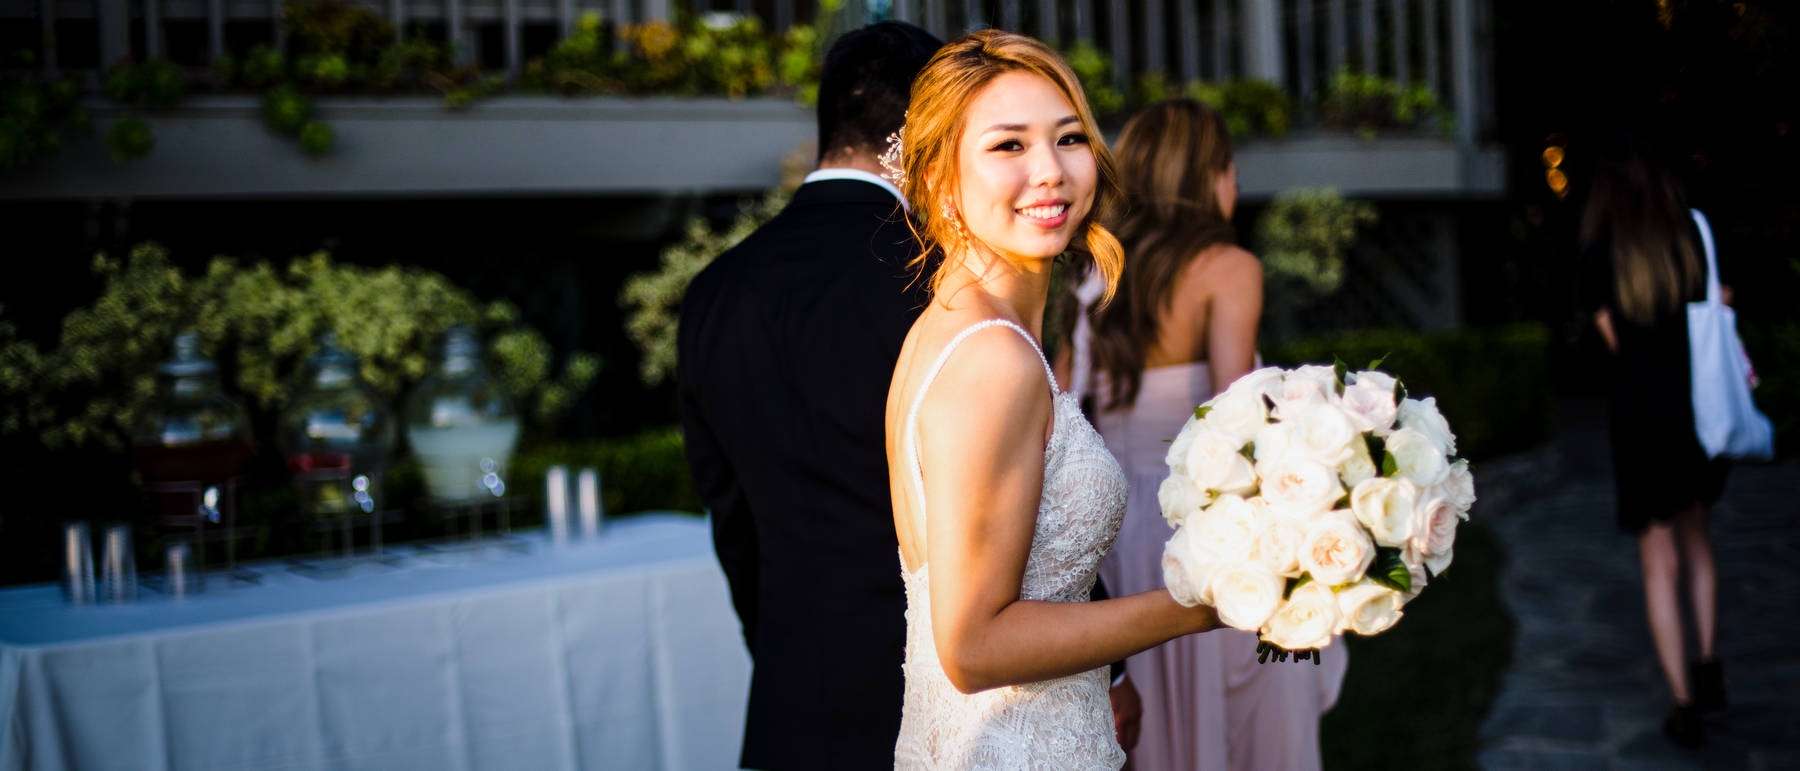 johnandjoseph-wedding-photographer-hz-slider-115